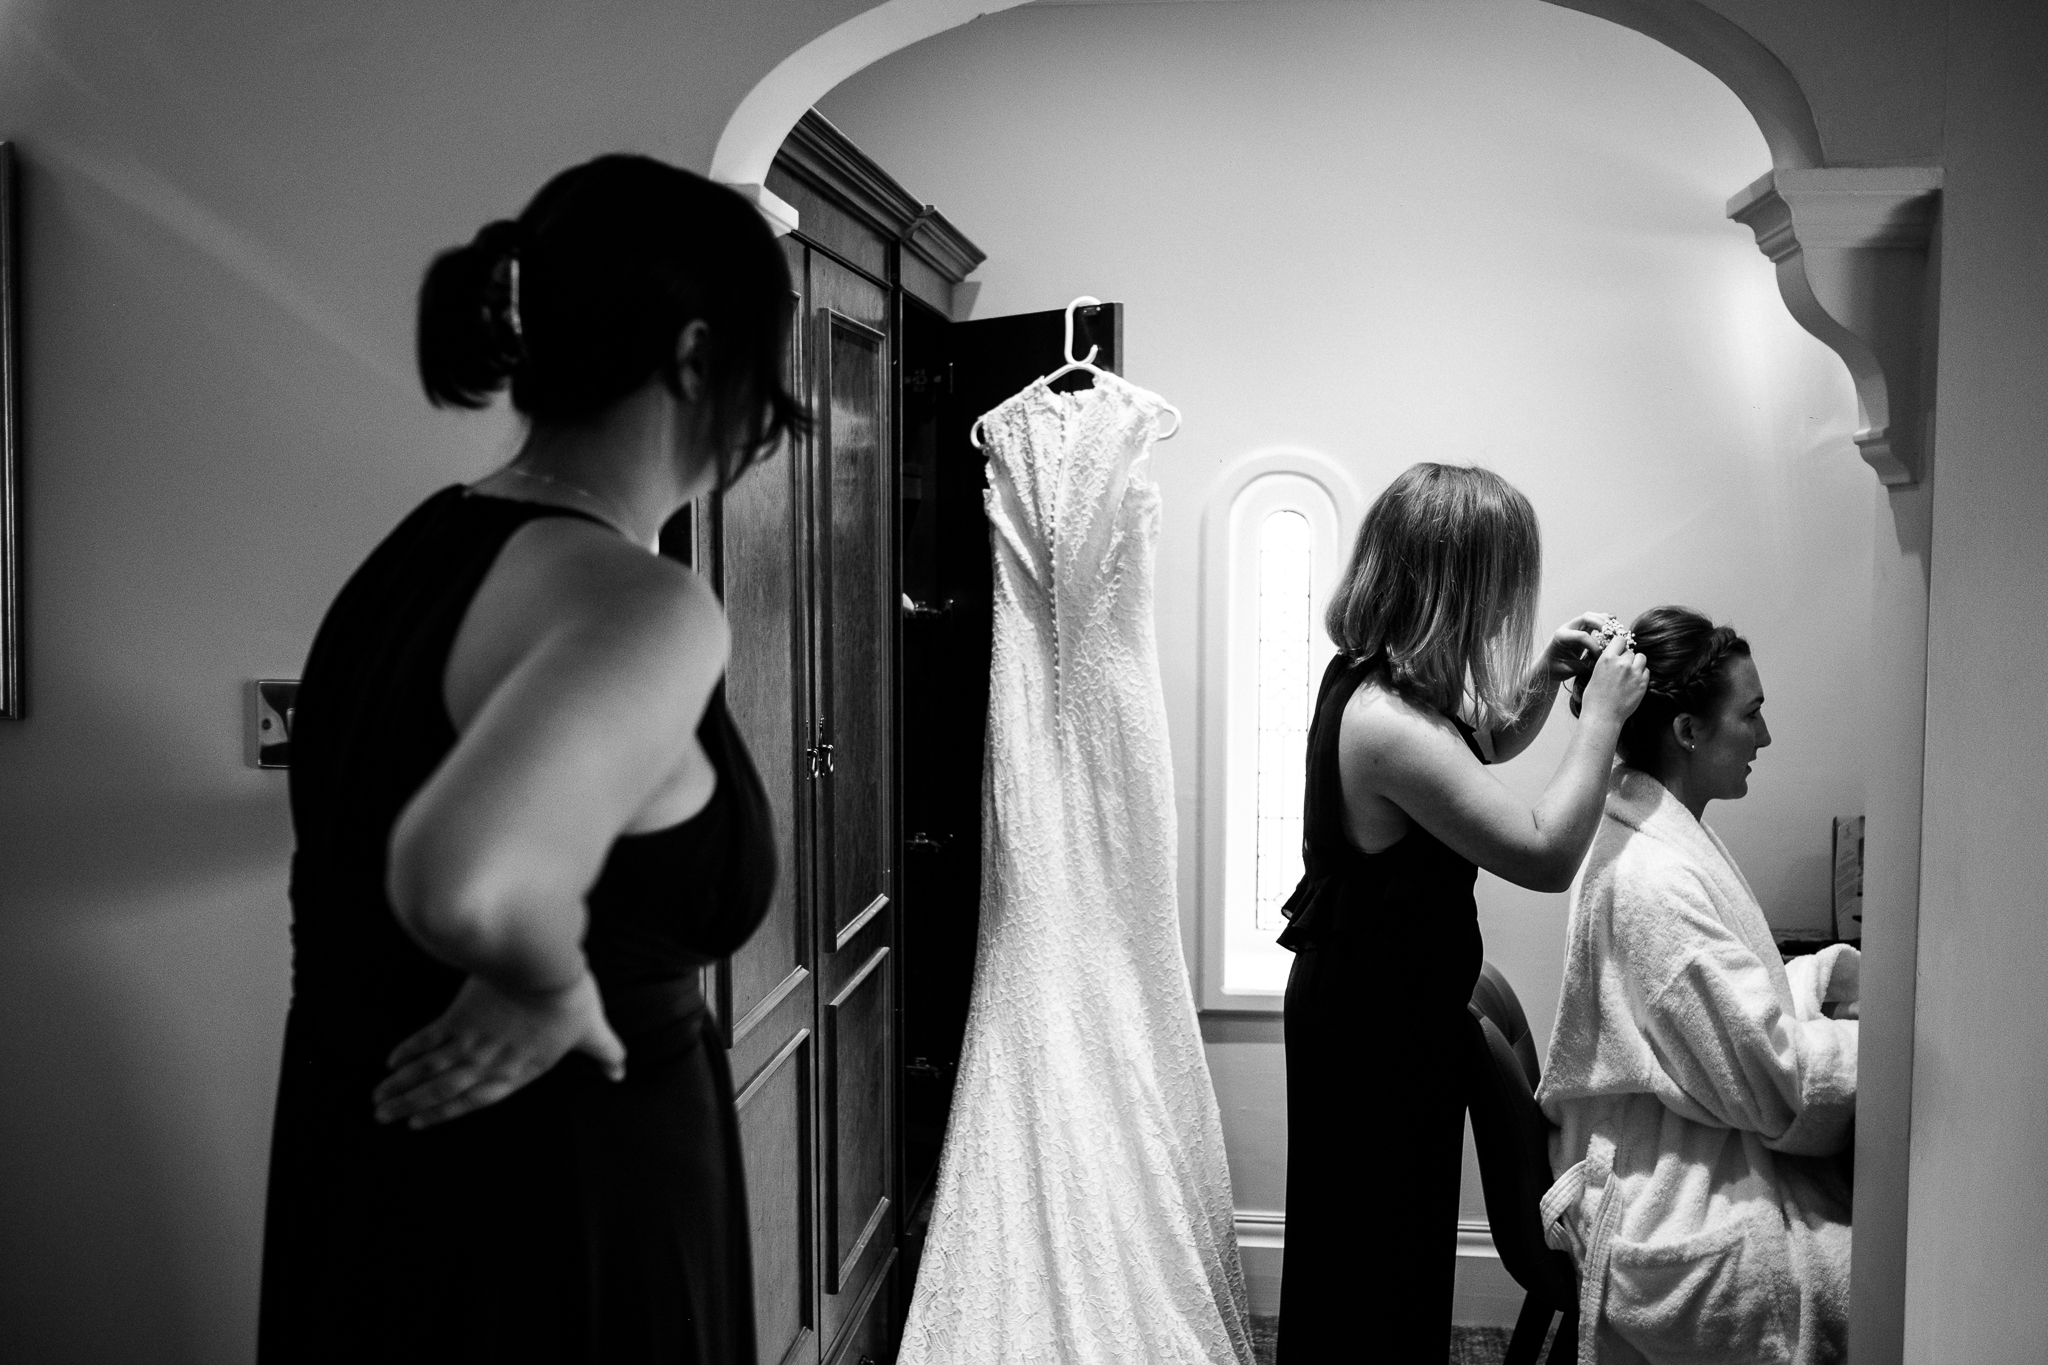 Relaxed Documentary Wedding Photography at The Wizard Inn, Alderley Edge Cheshire - Jenny Harper-8.jpg